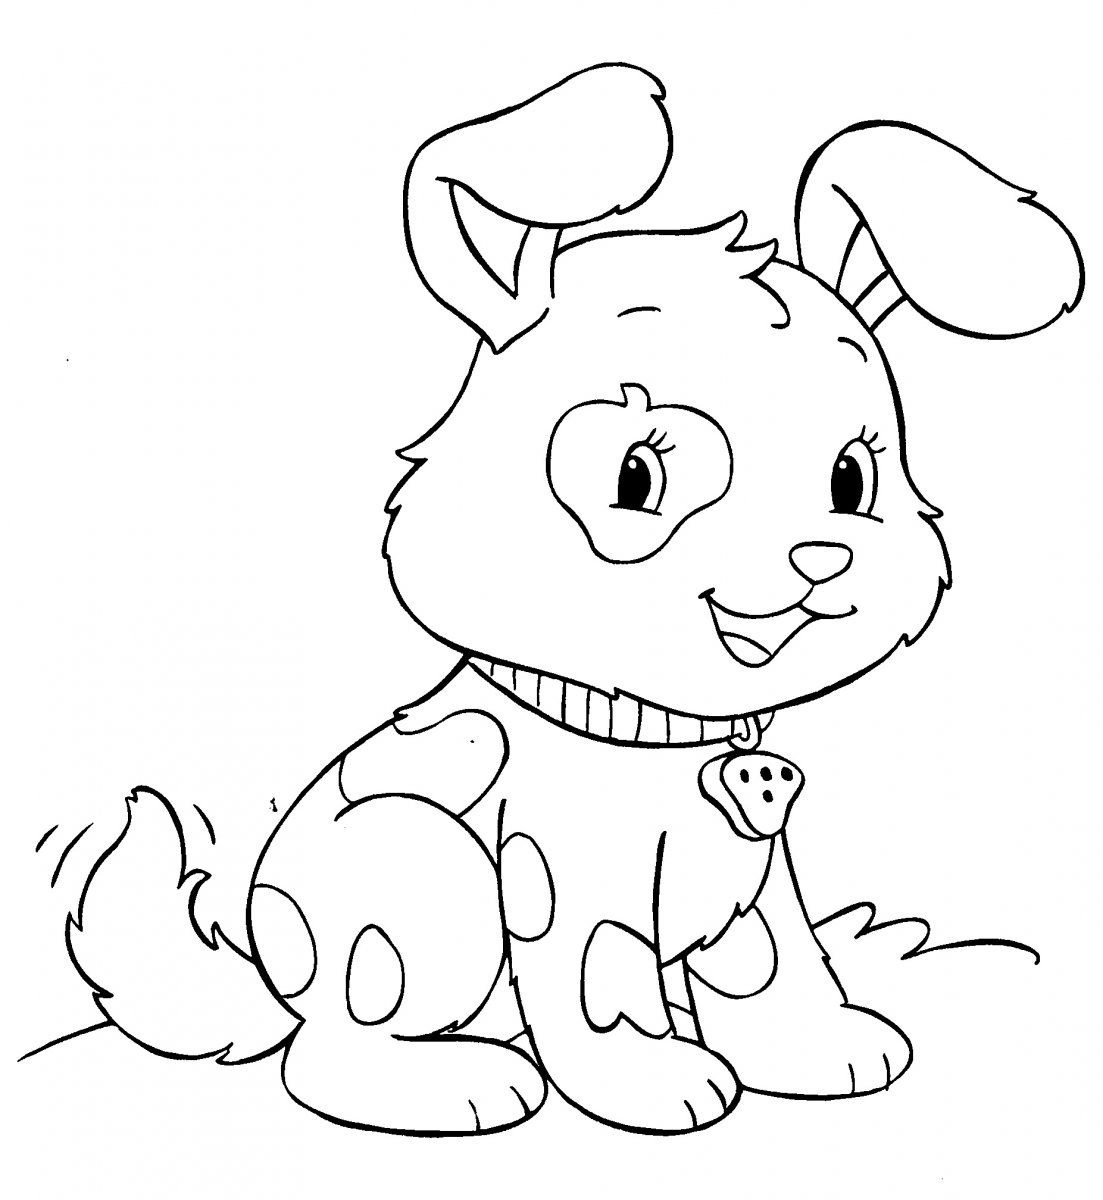 Dibujos Para Colorear E Imprimir | Dibujo de Perrito para colorear ...